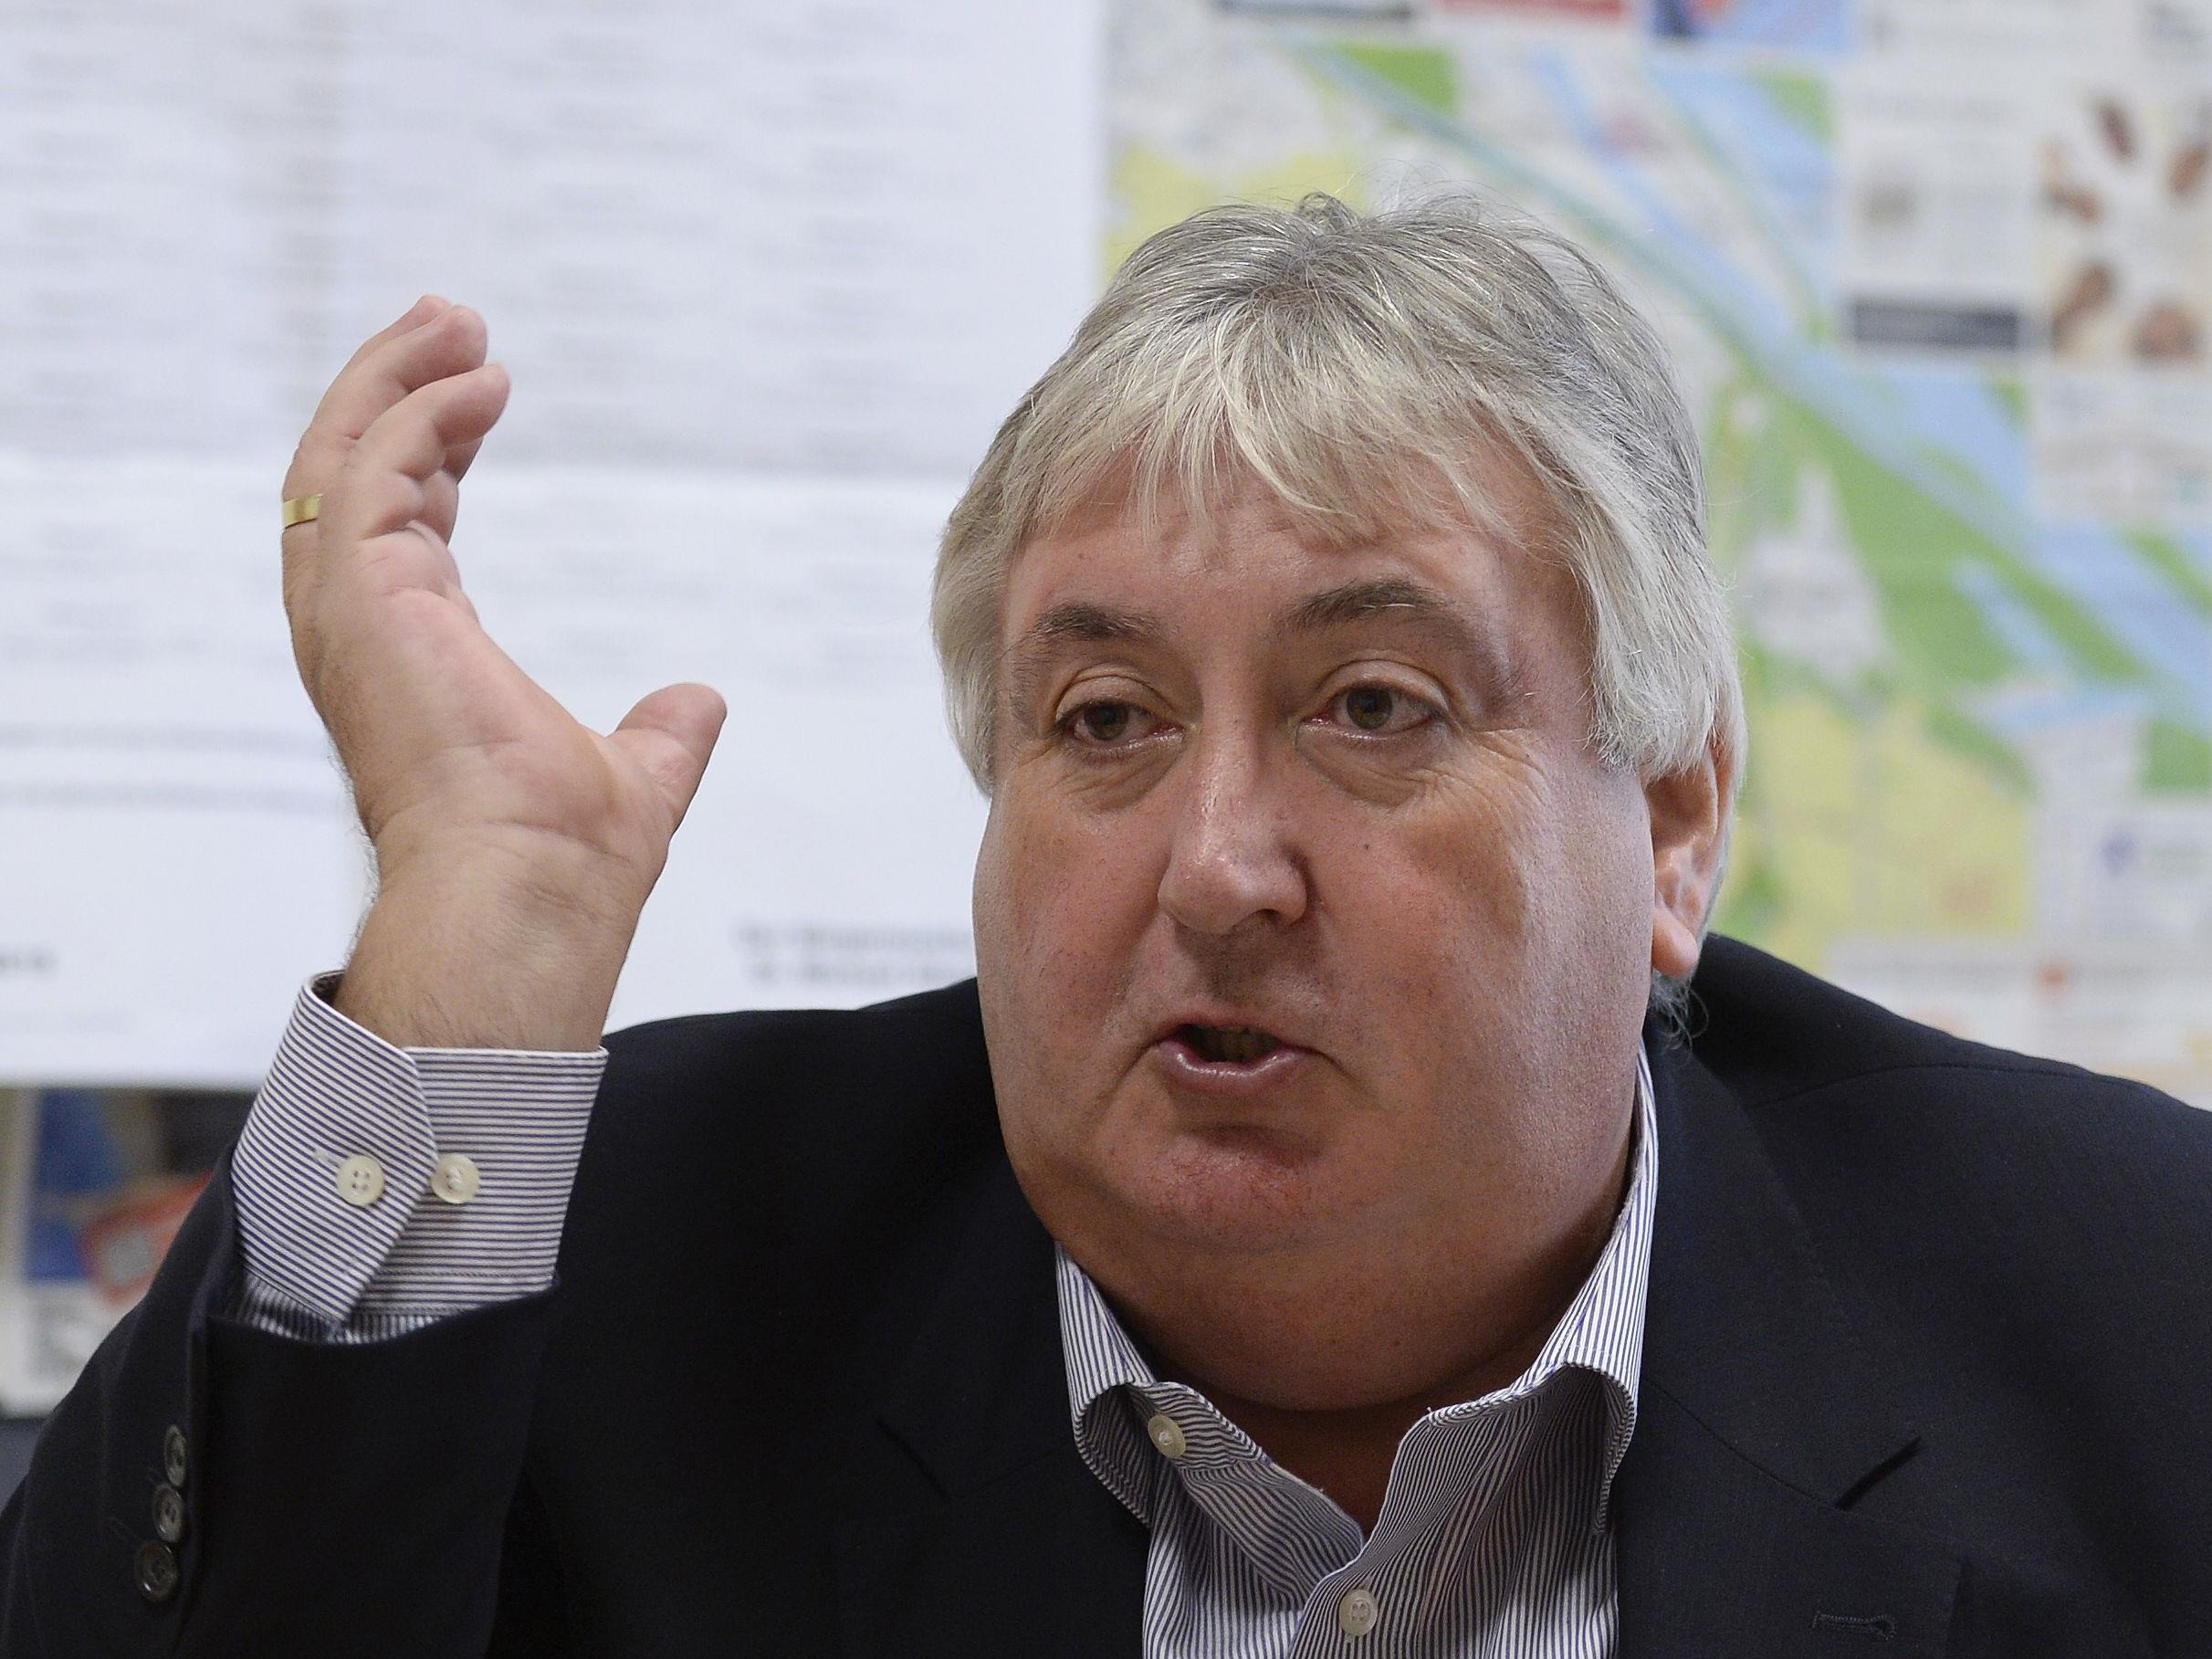 FPÖ-Bezirksvorsteher Paul Stadler will herkunft bei Parkpickerl-Befragung abfragen.